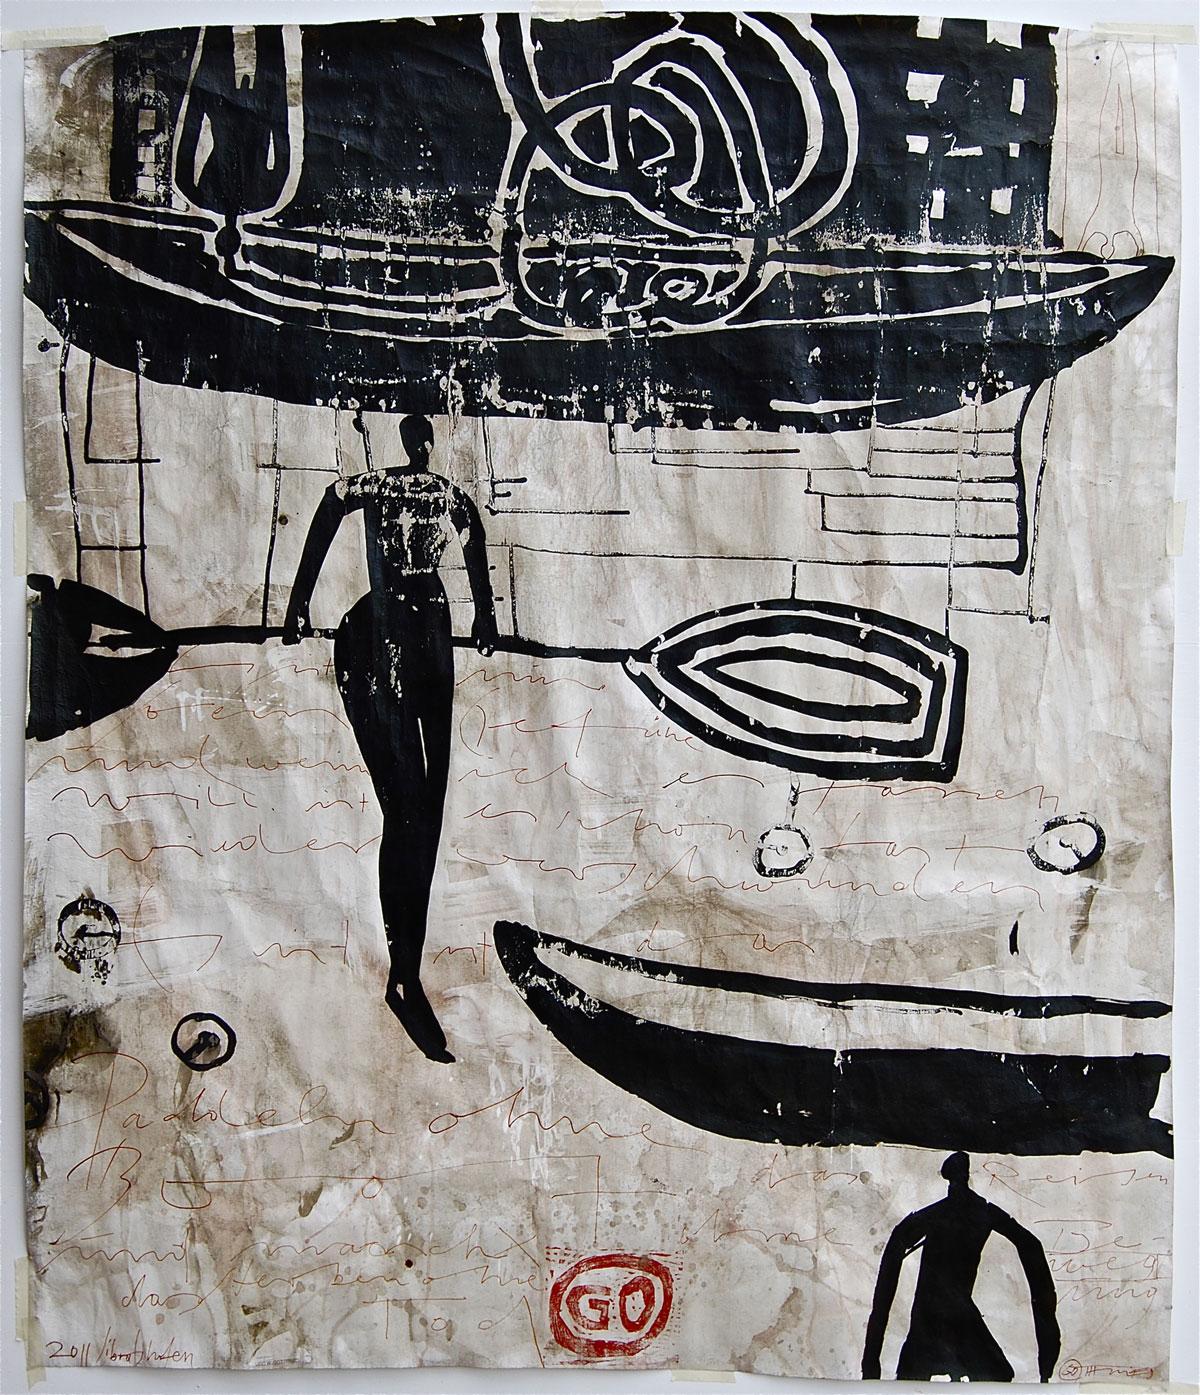 Paddeln ohne Boot, 2011